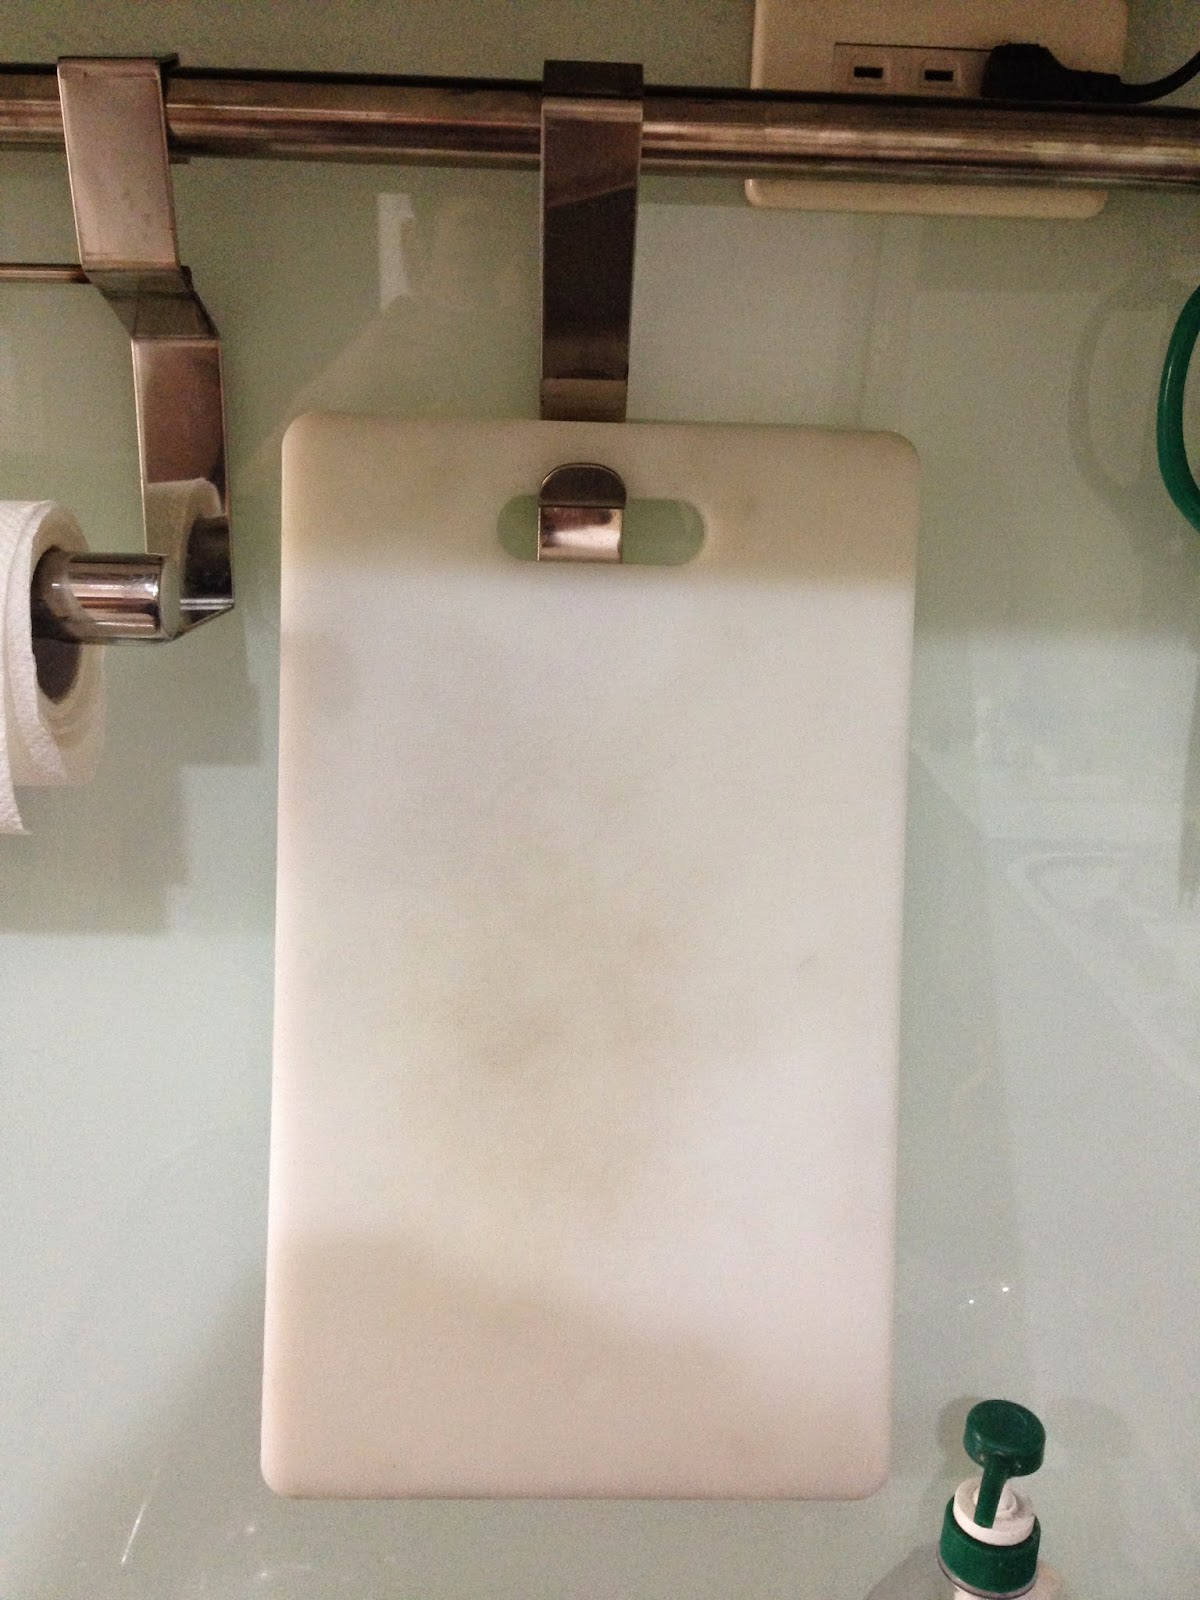 kitchen sinks compact kitchens nz 國筌工業社: 家用流理台、排油煙機、厨房工作台、白鐵吧咍 ...